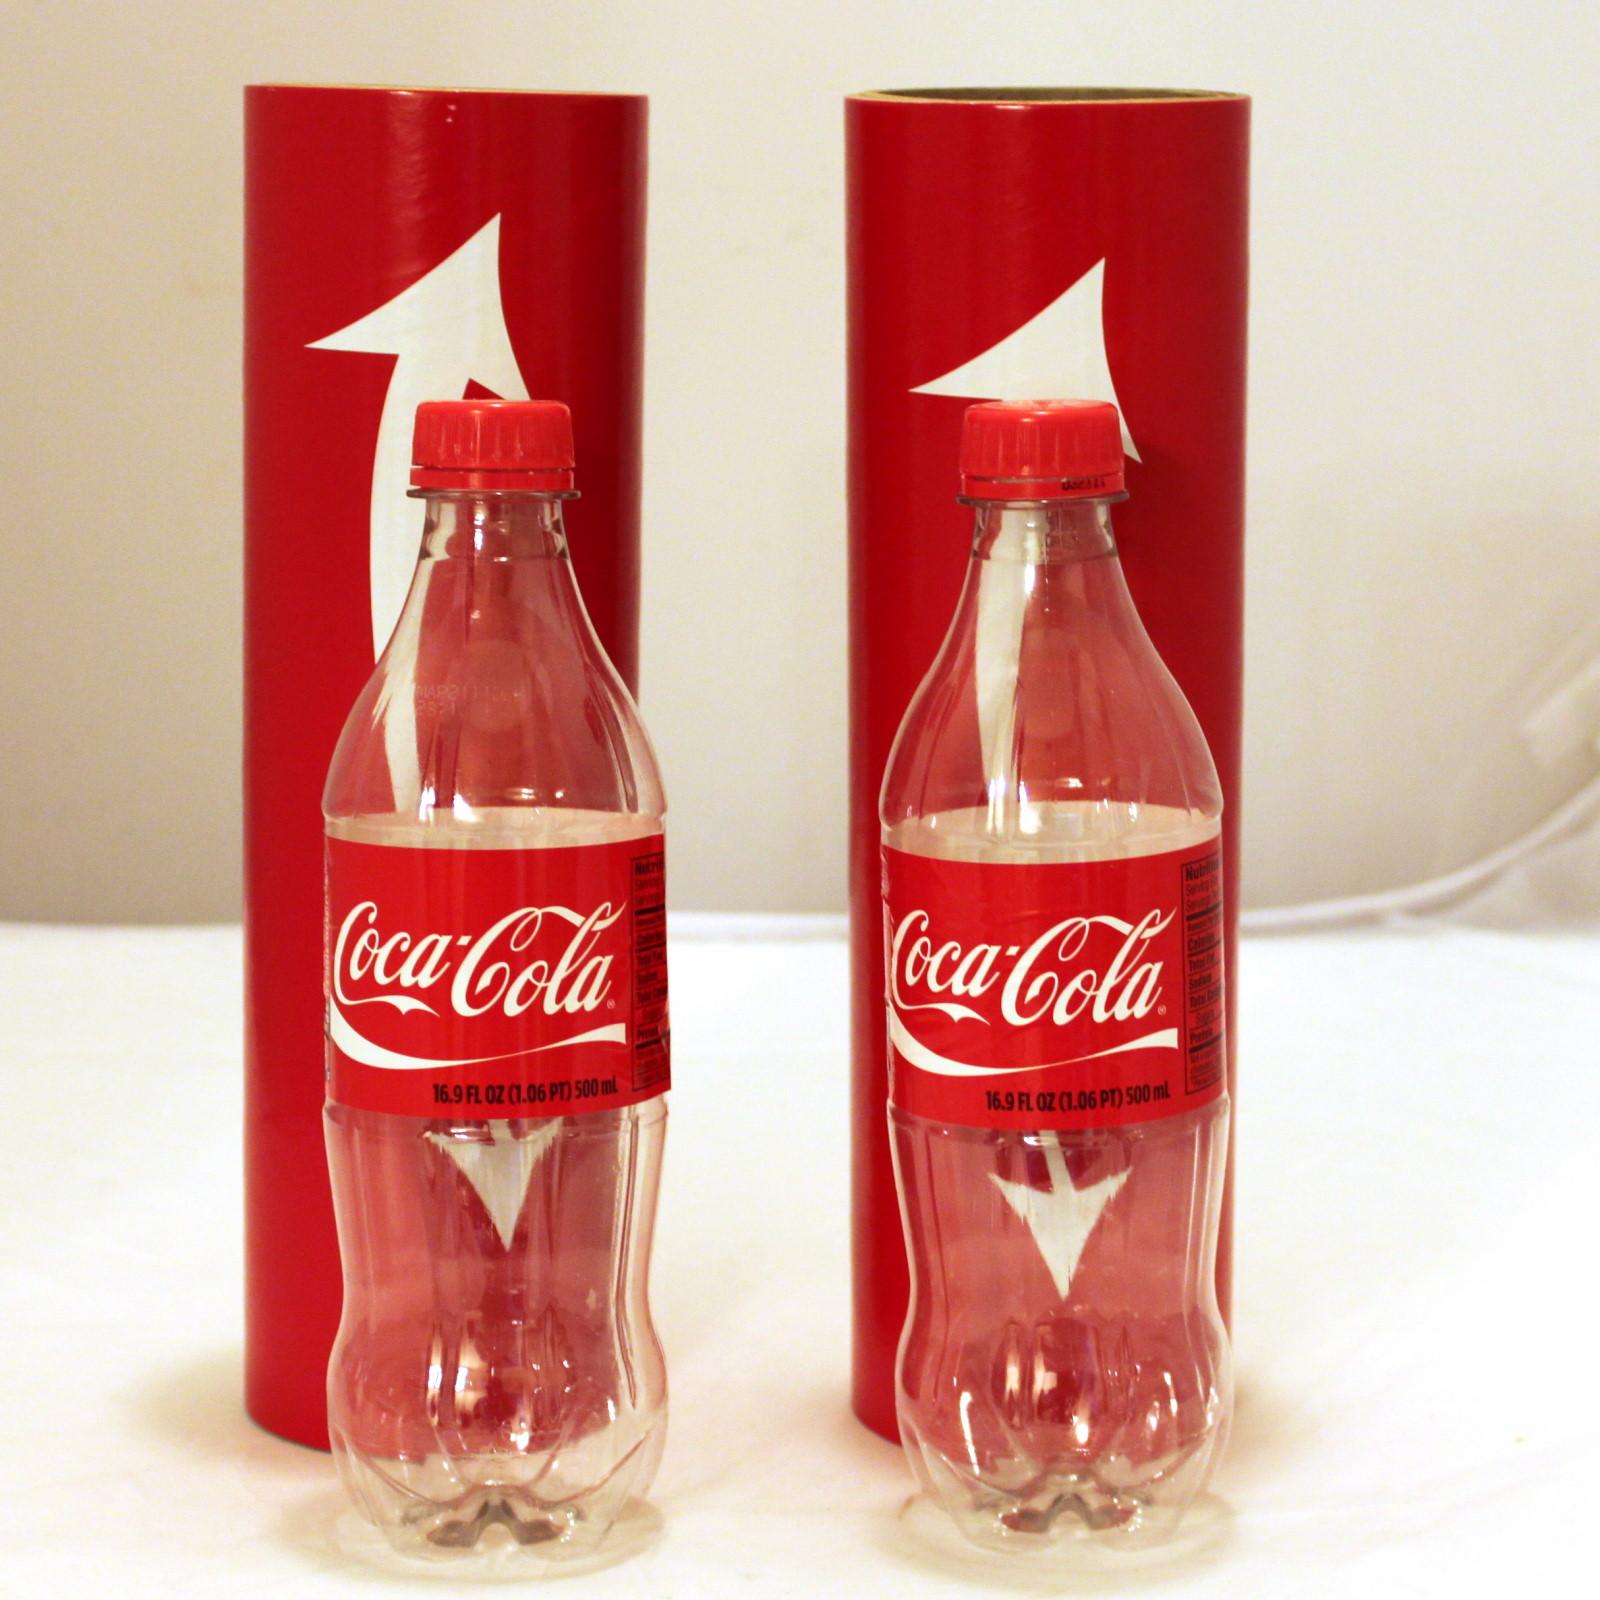 Topsy Turvy Soda Bottles by Wack-O-Magic